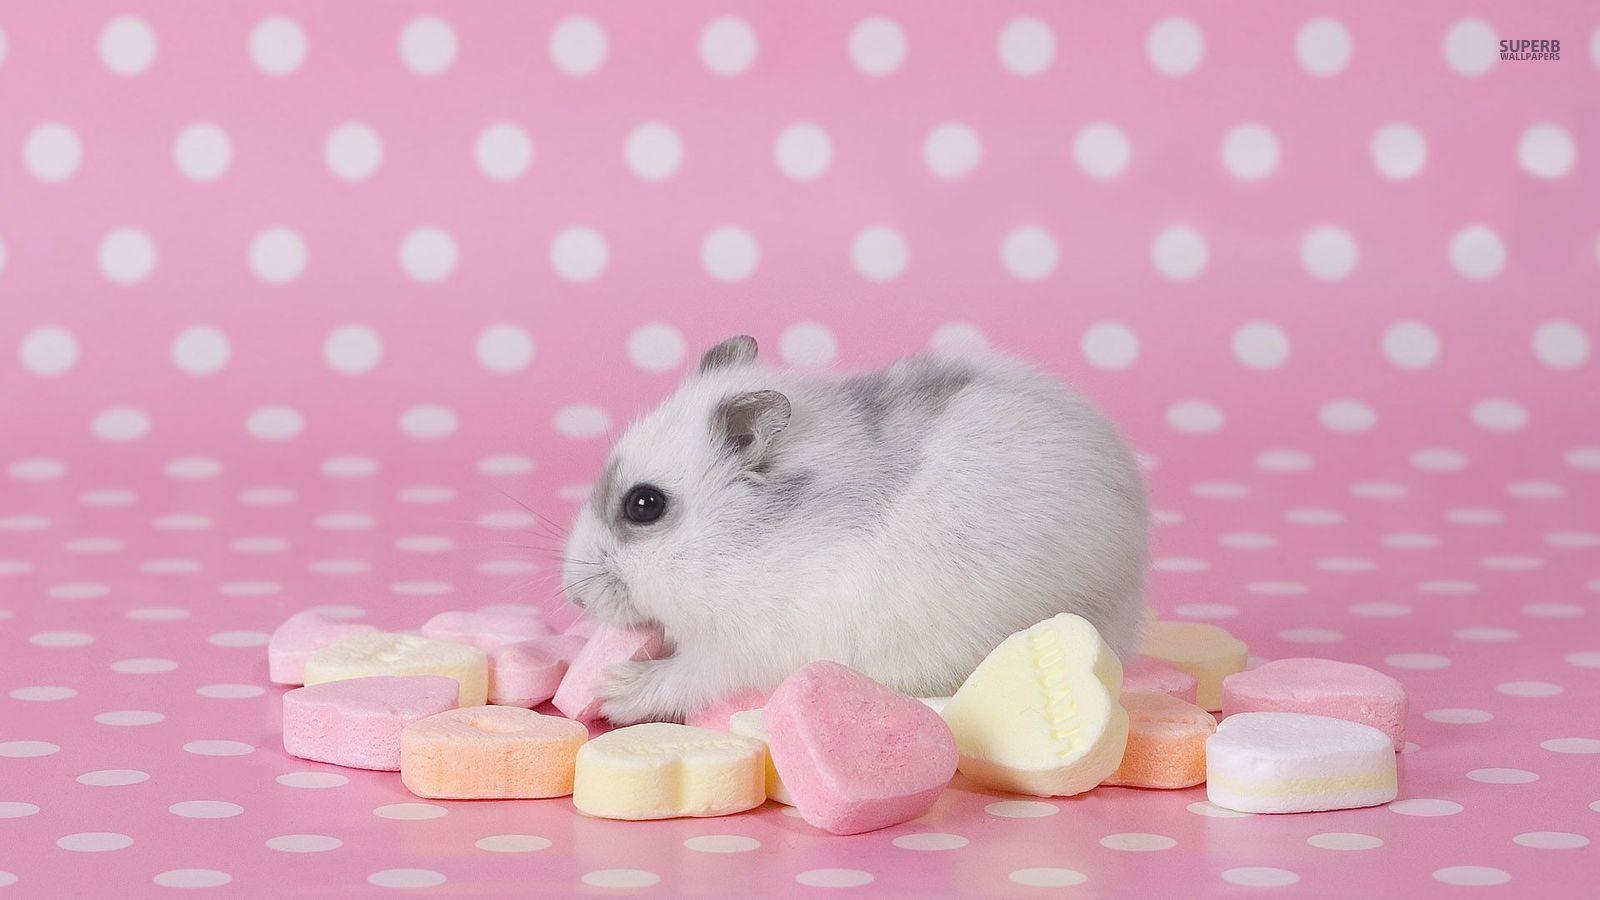 Hamster - Animals Wallpaper (38674646) - Fanpop